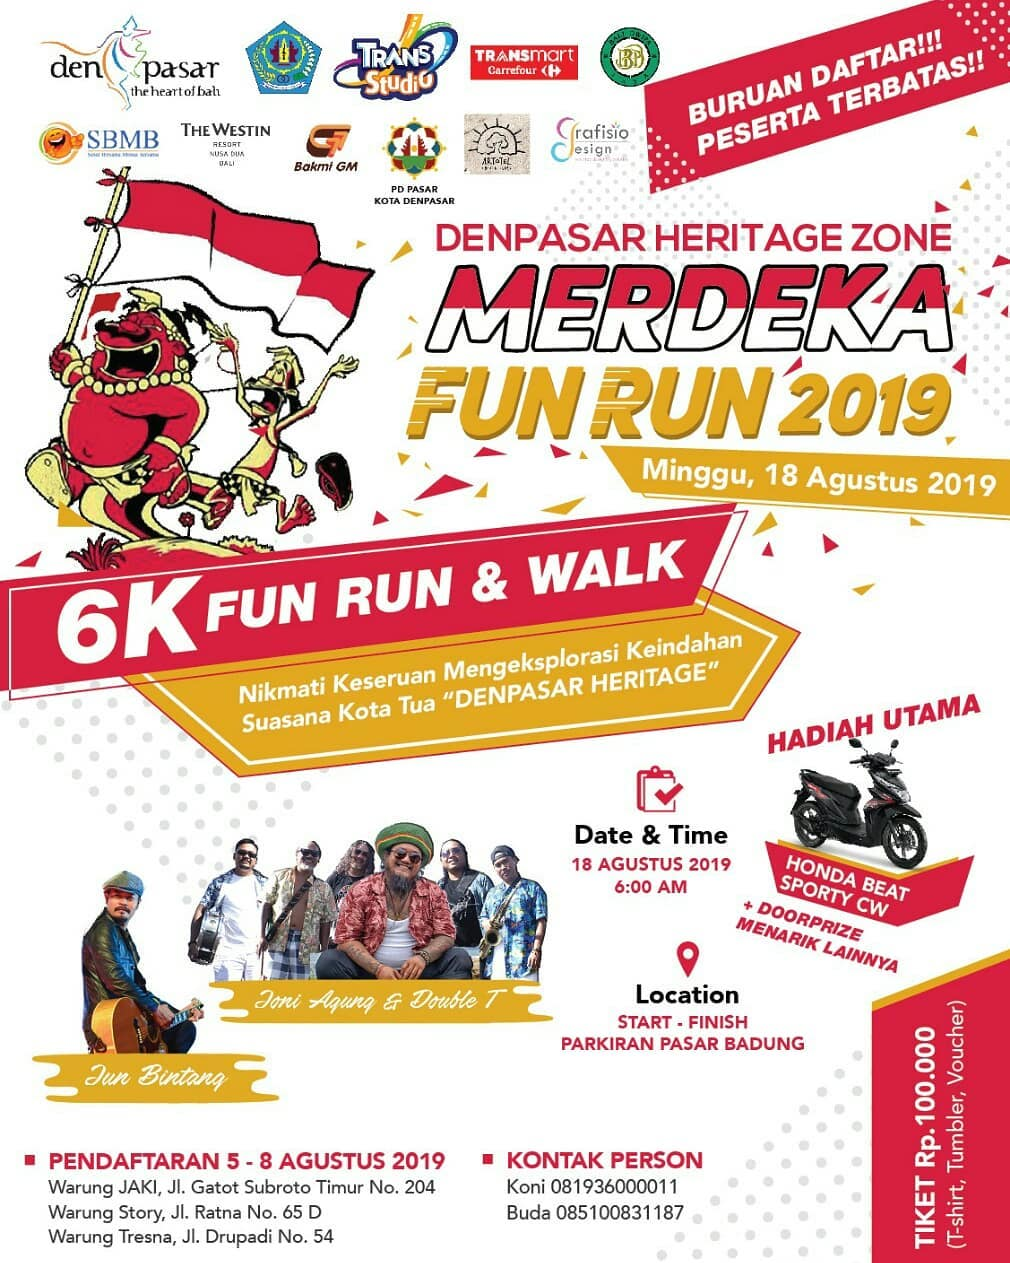 Merdeka Fun Run - Denpasar Heritage Zone • 2019